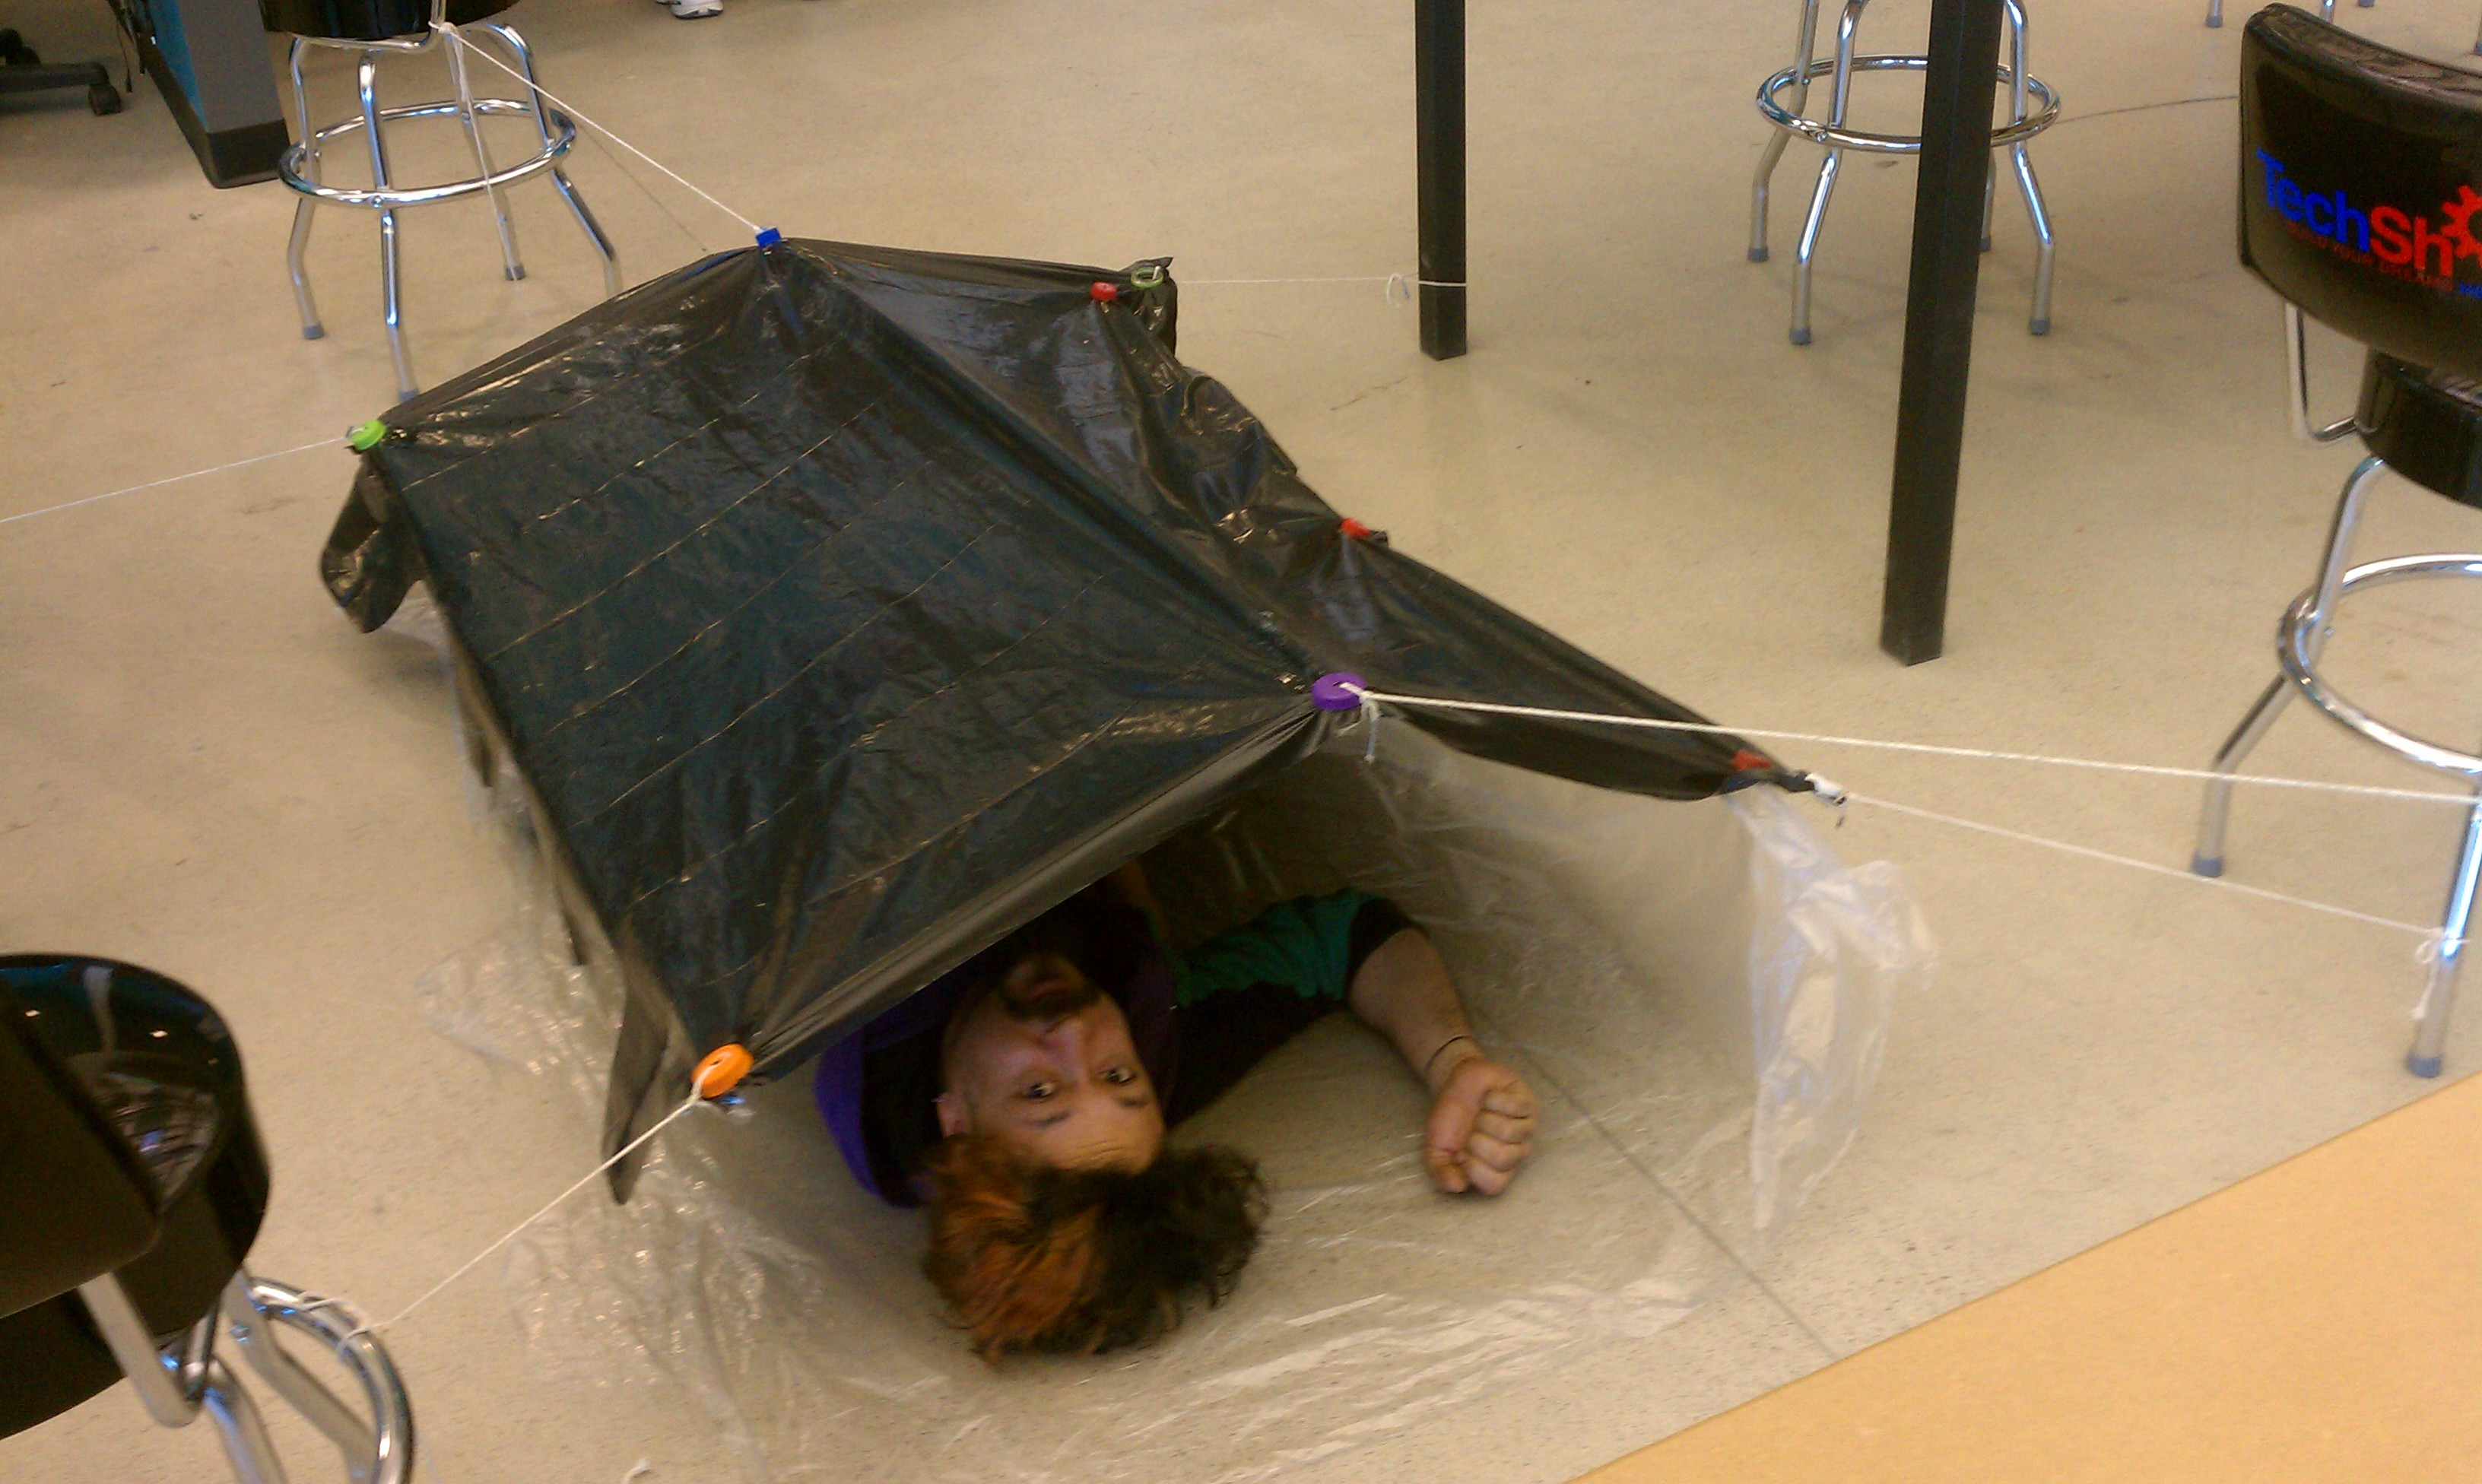 Ultra light tent for bike camping @TechShop